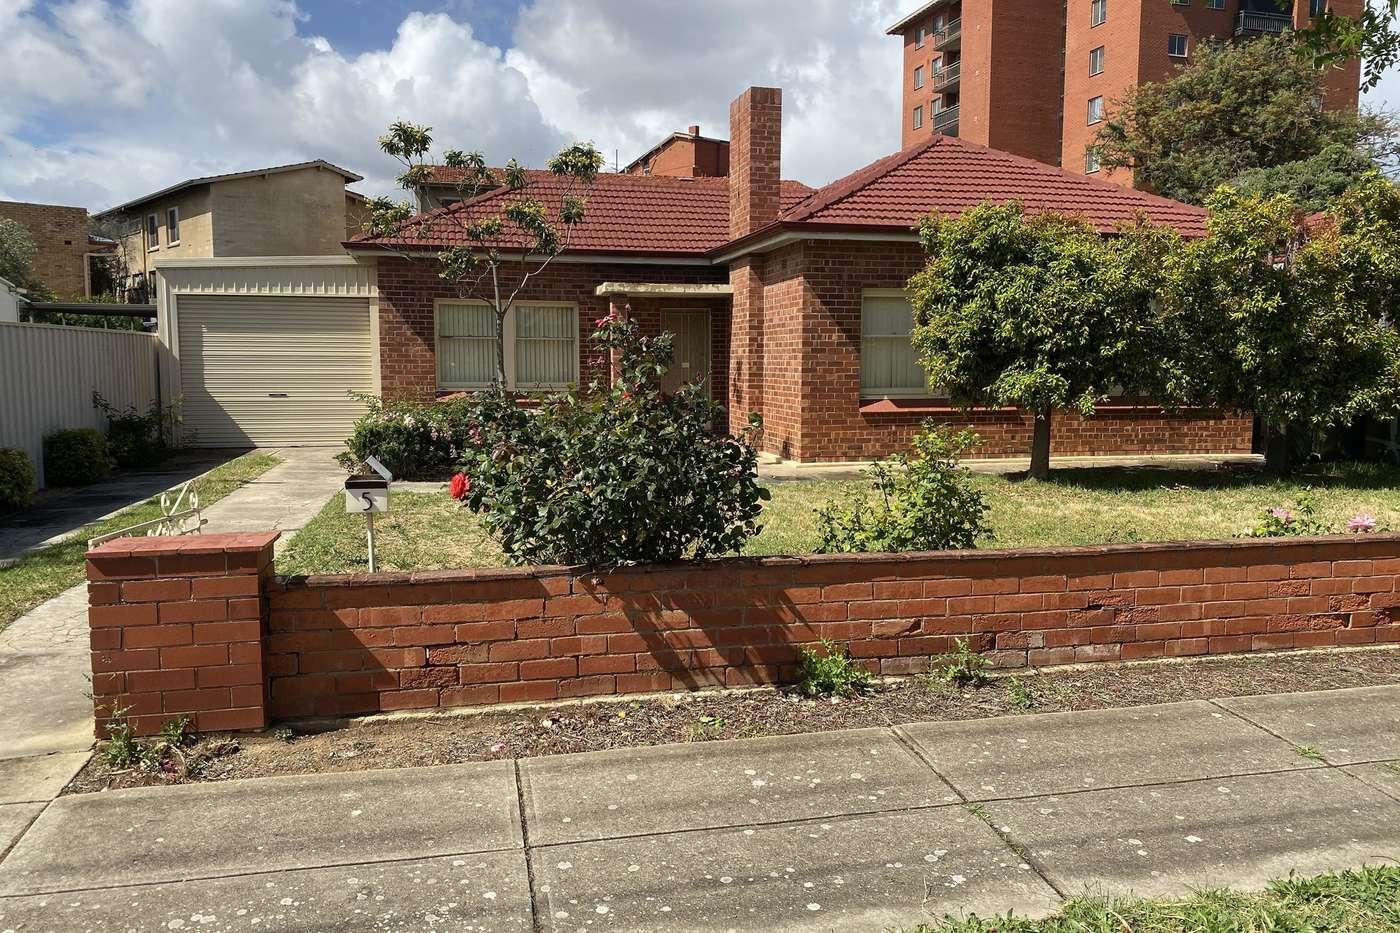 Main view of Homely house listing, 5 Glenburnie Terrace, Plympton, SA 5038